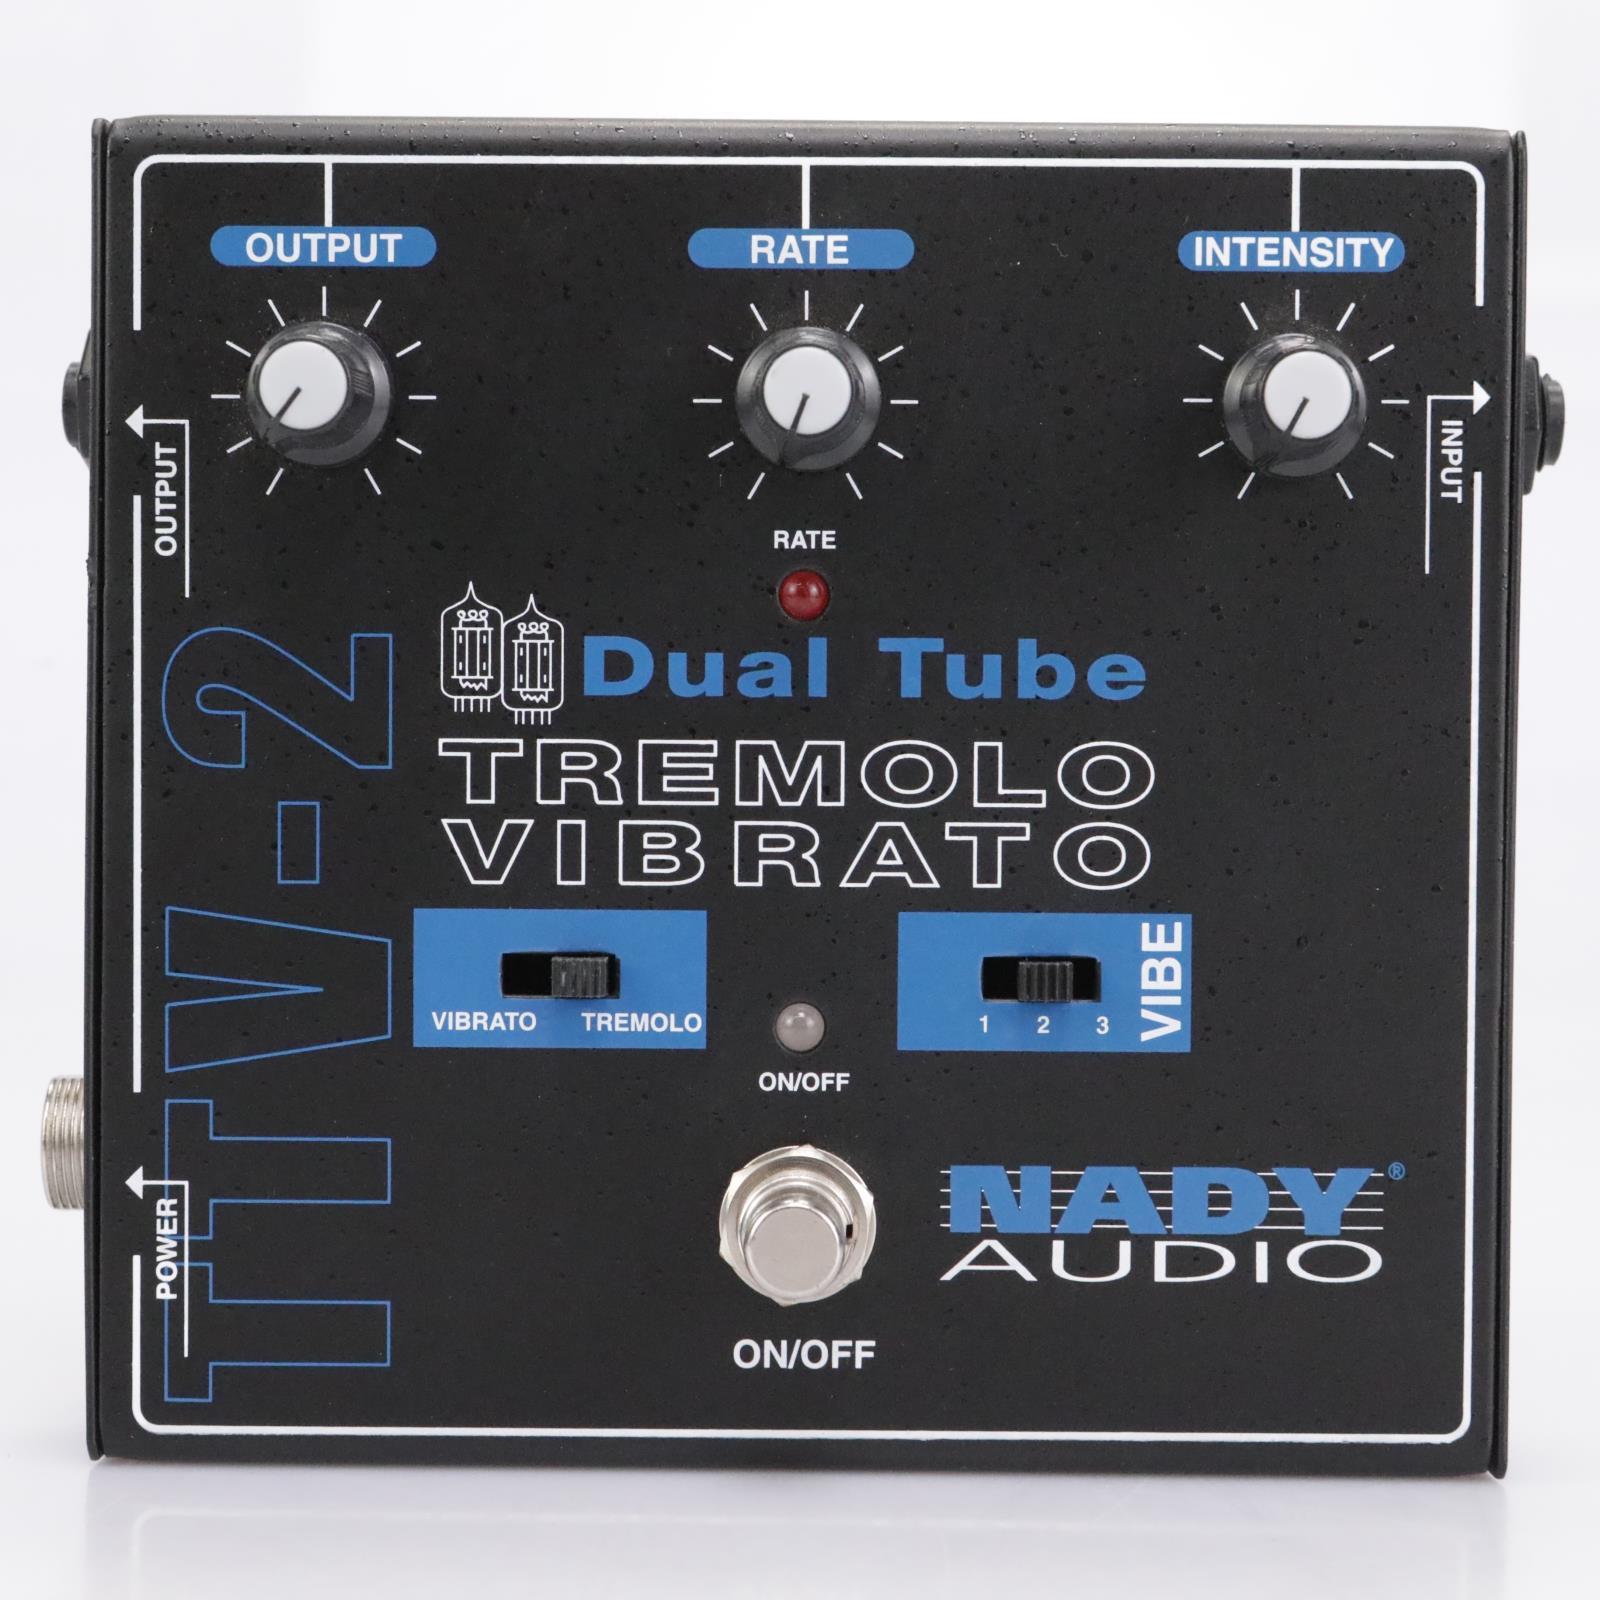 Nady Audio TTV-2 Dual Tube Tremolo Vibrato Guitar Effects Pedal #43081